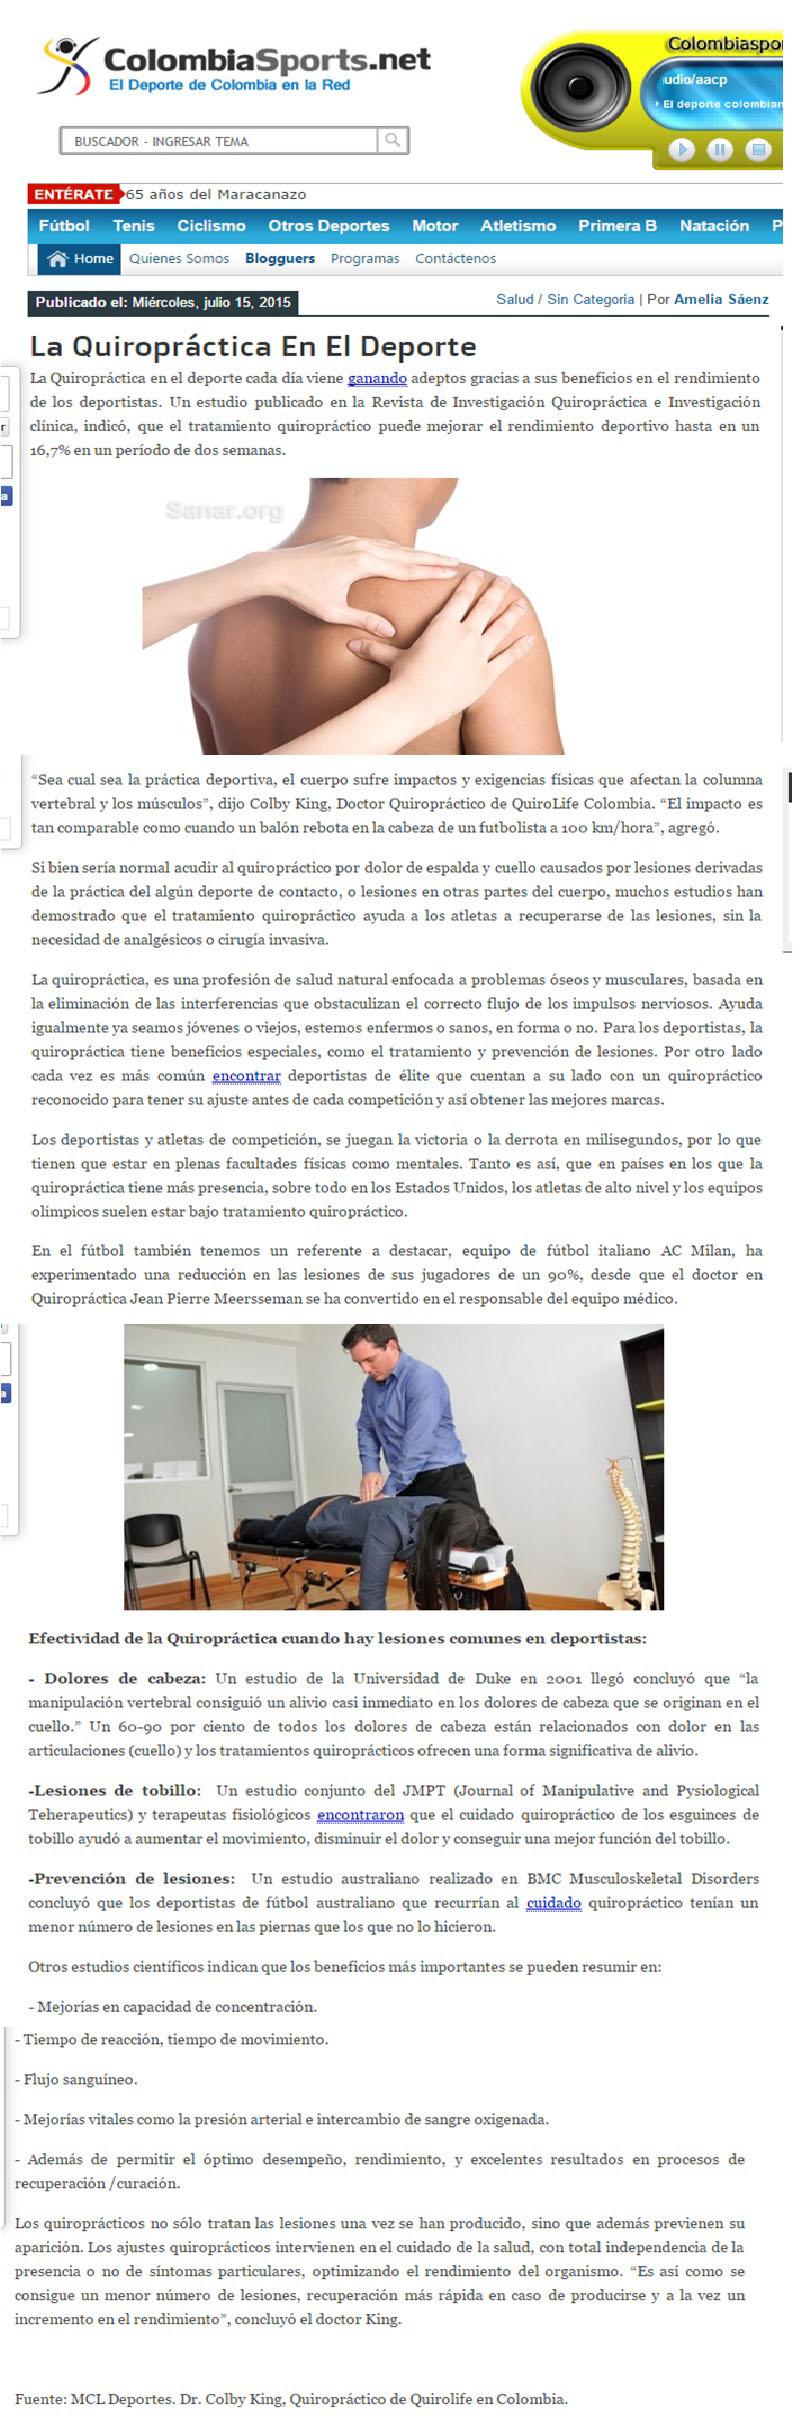 Colombiasport.net 15 de julio[web]